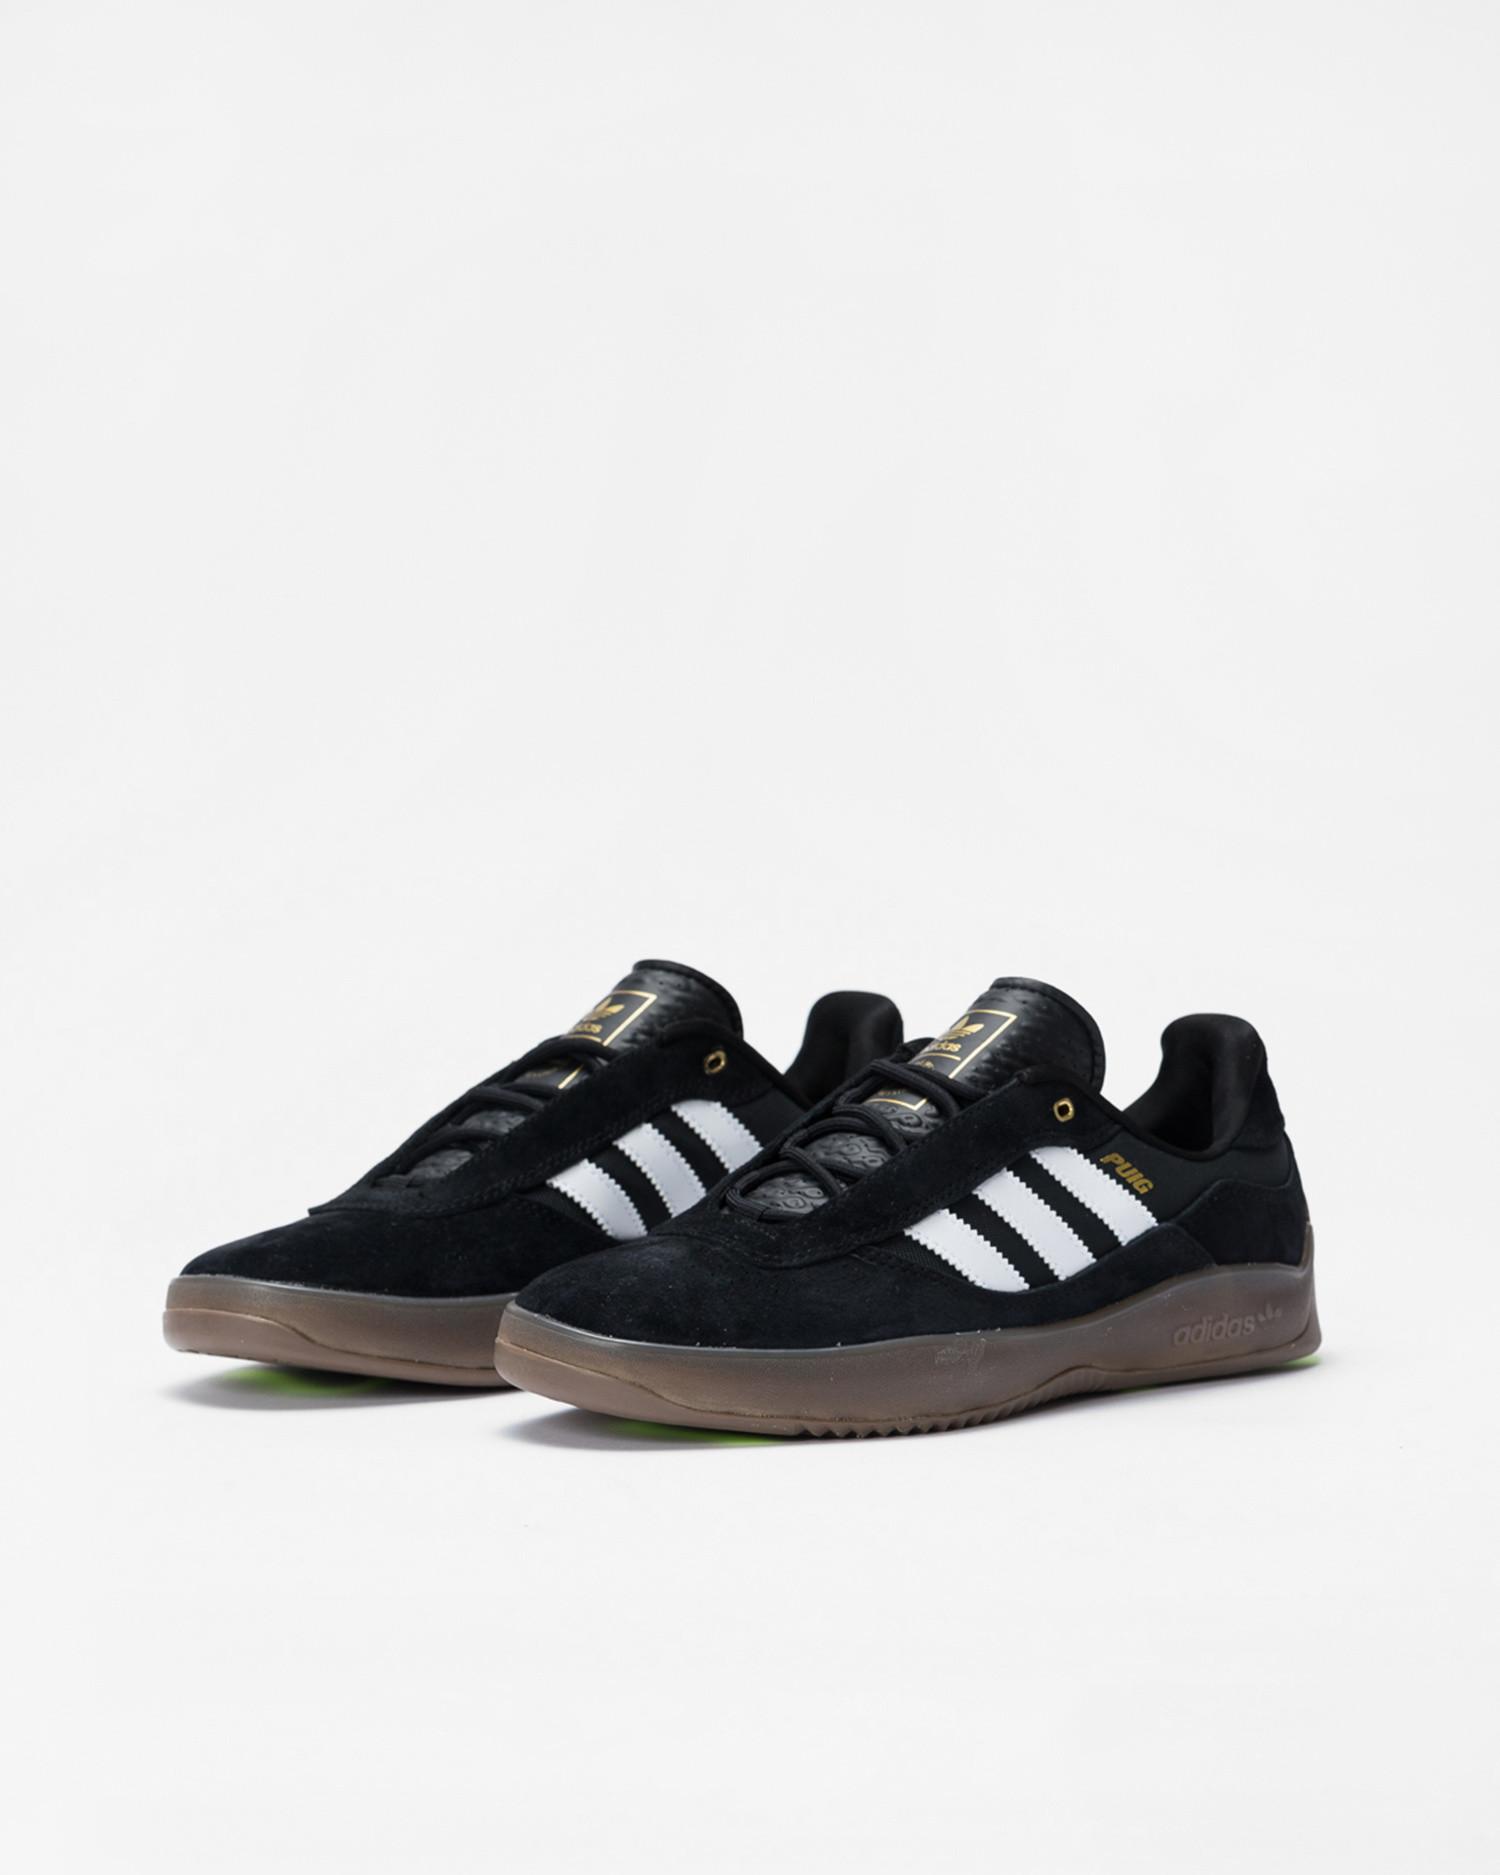 Adidas Puig Core Black/Signal Green/White